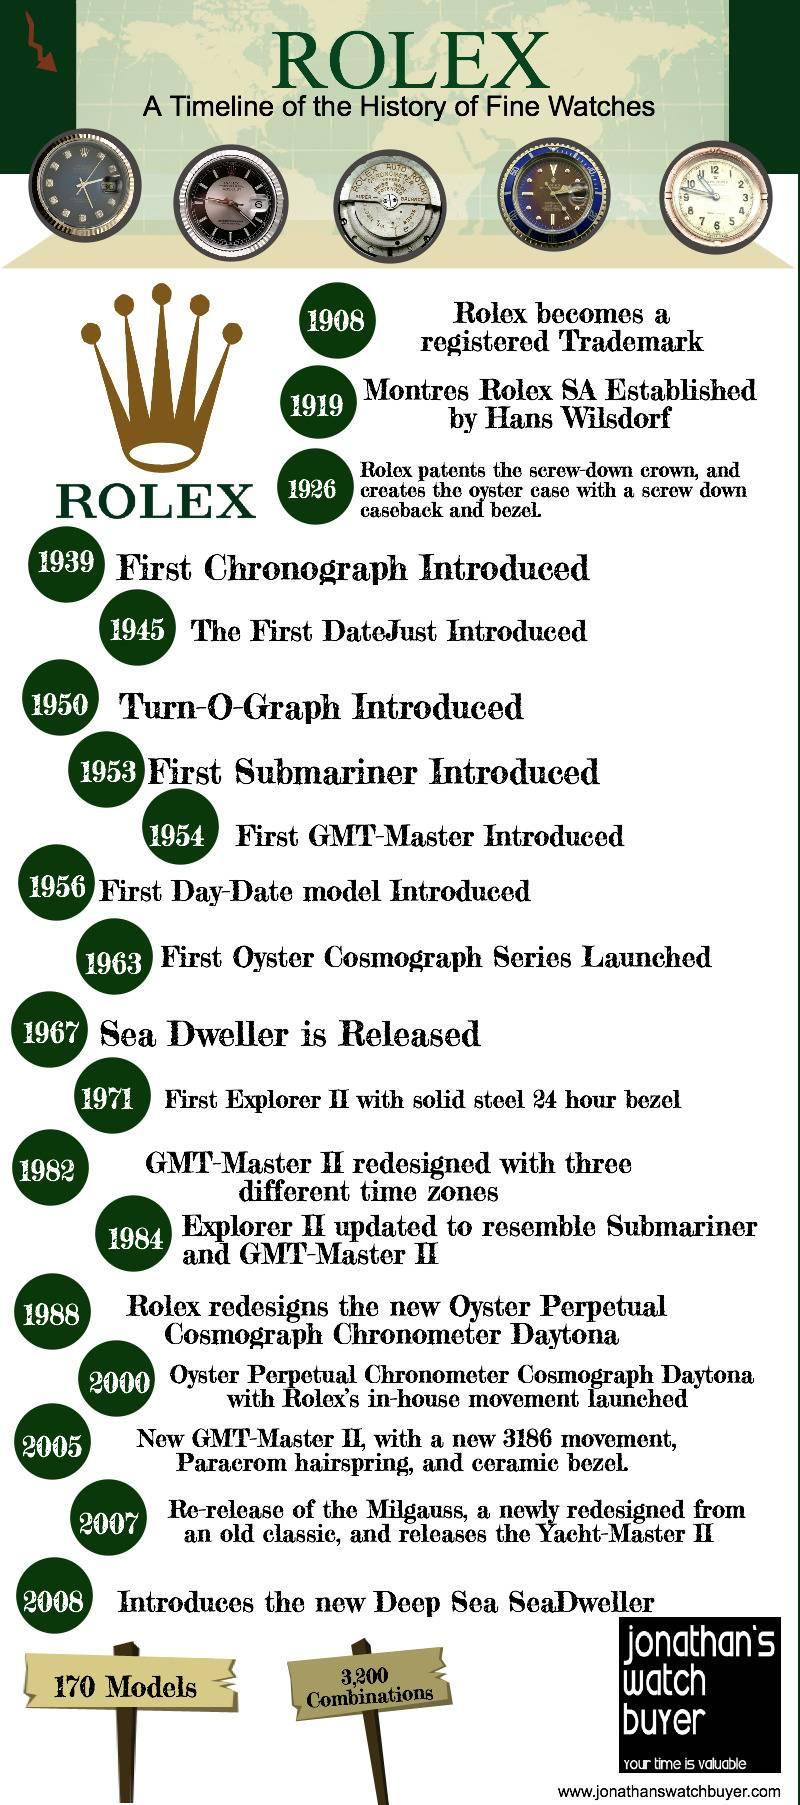 Rolex Infographic